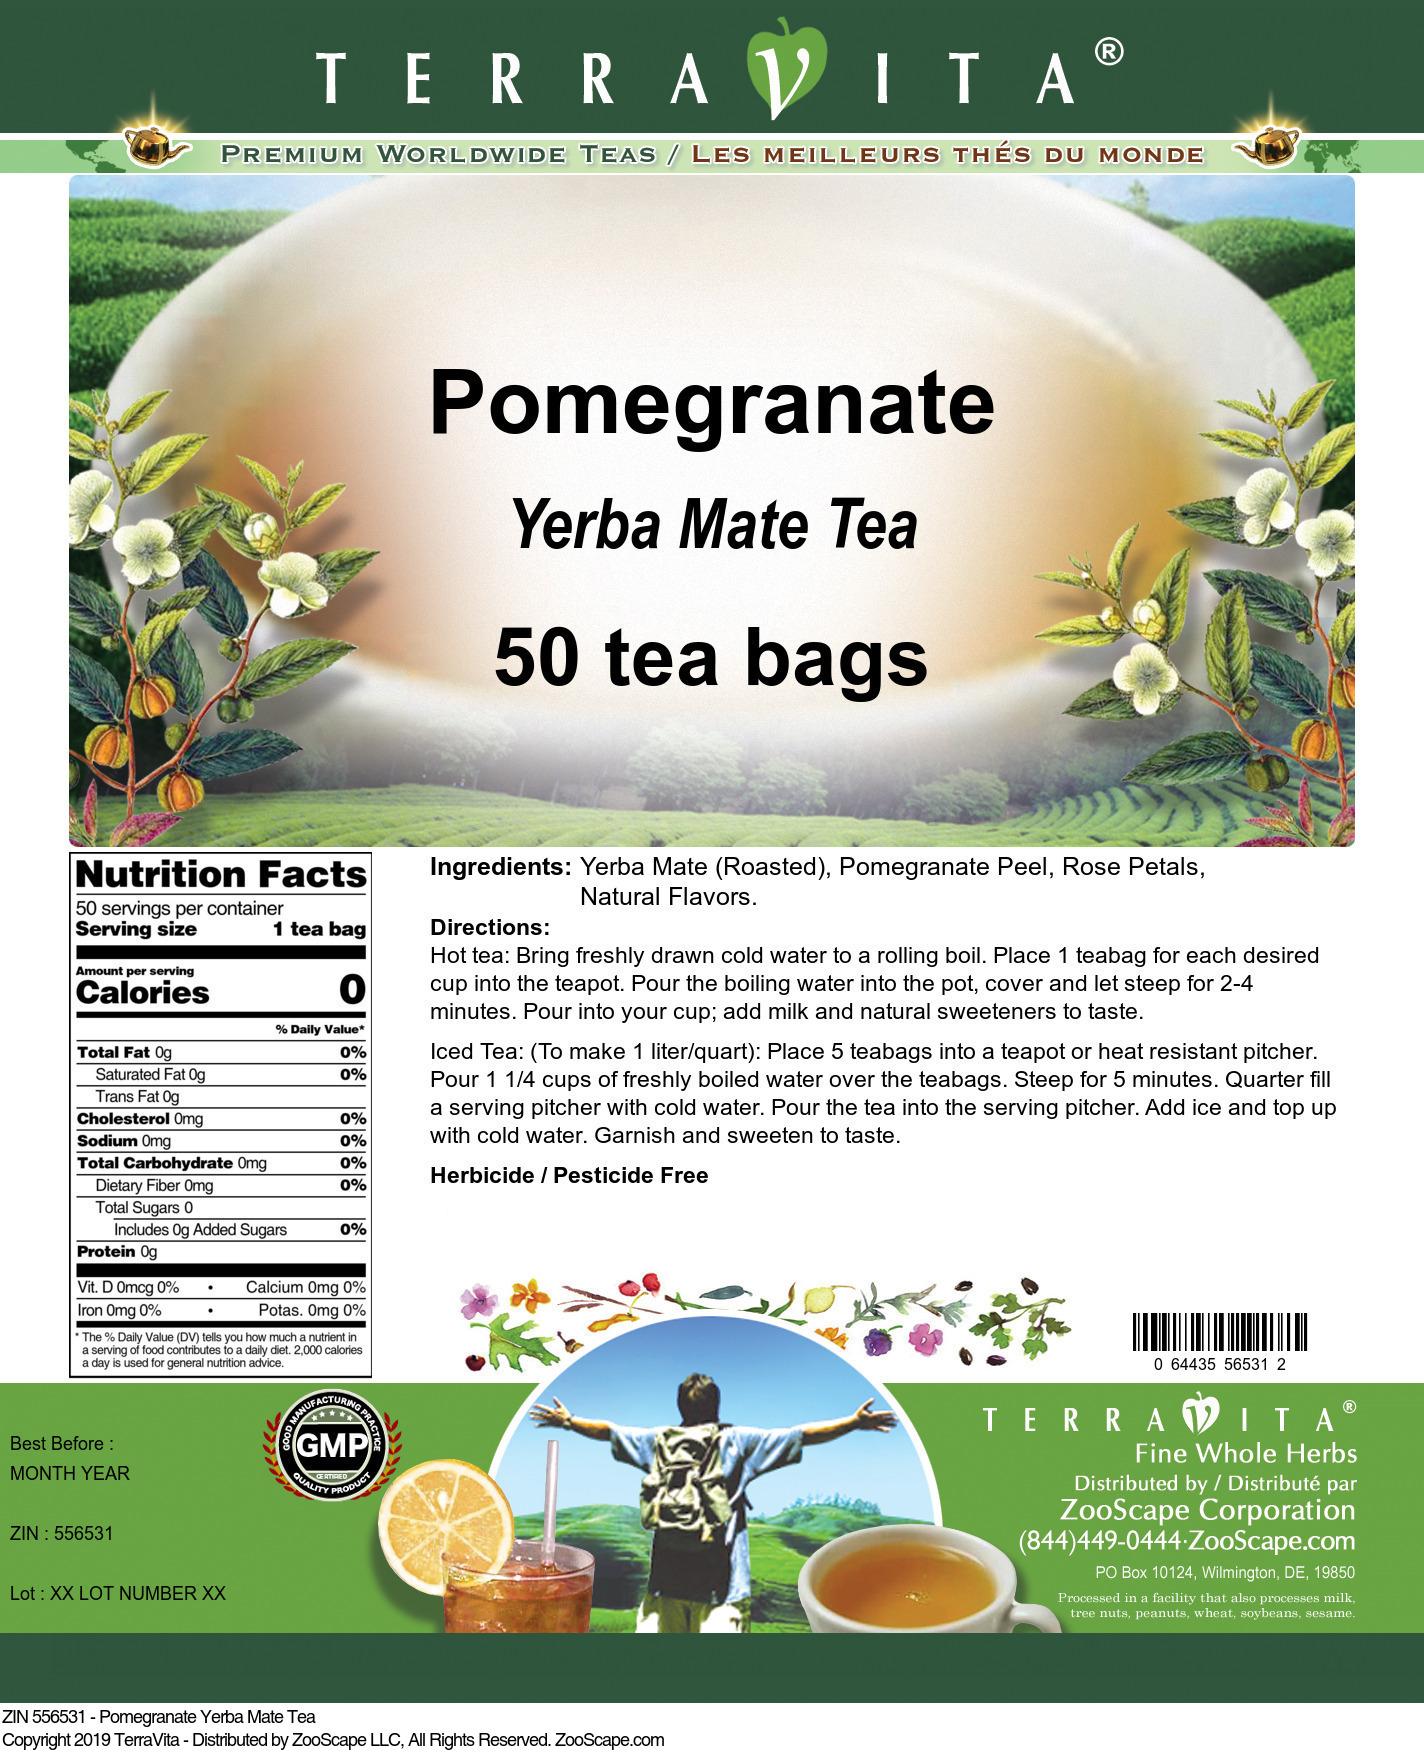 Pomegranate Yerba Mate Tea